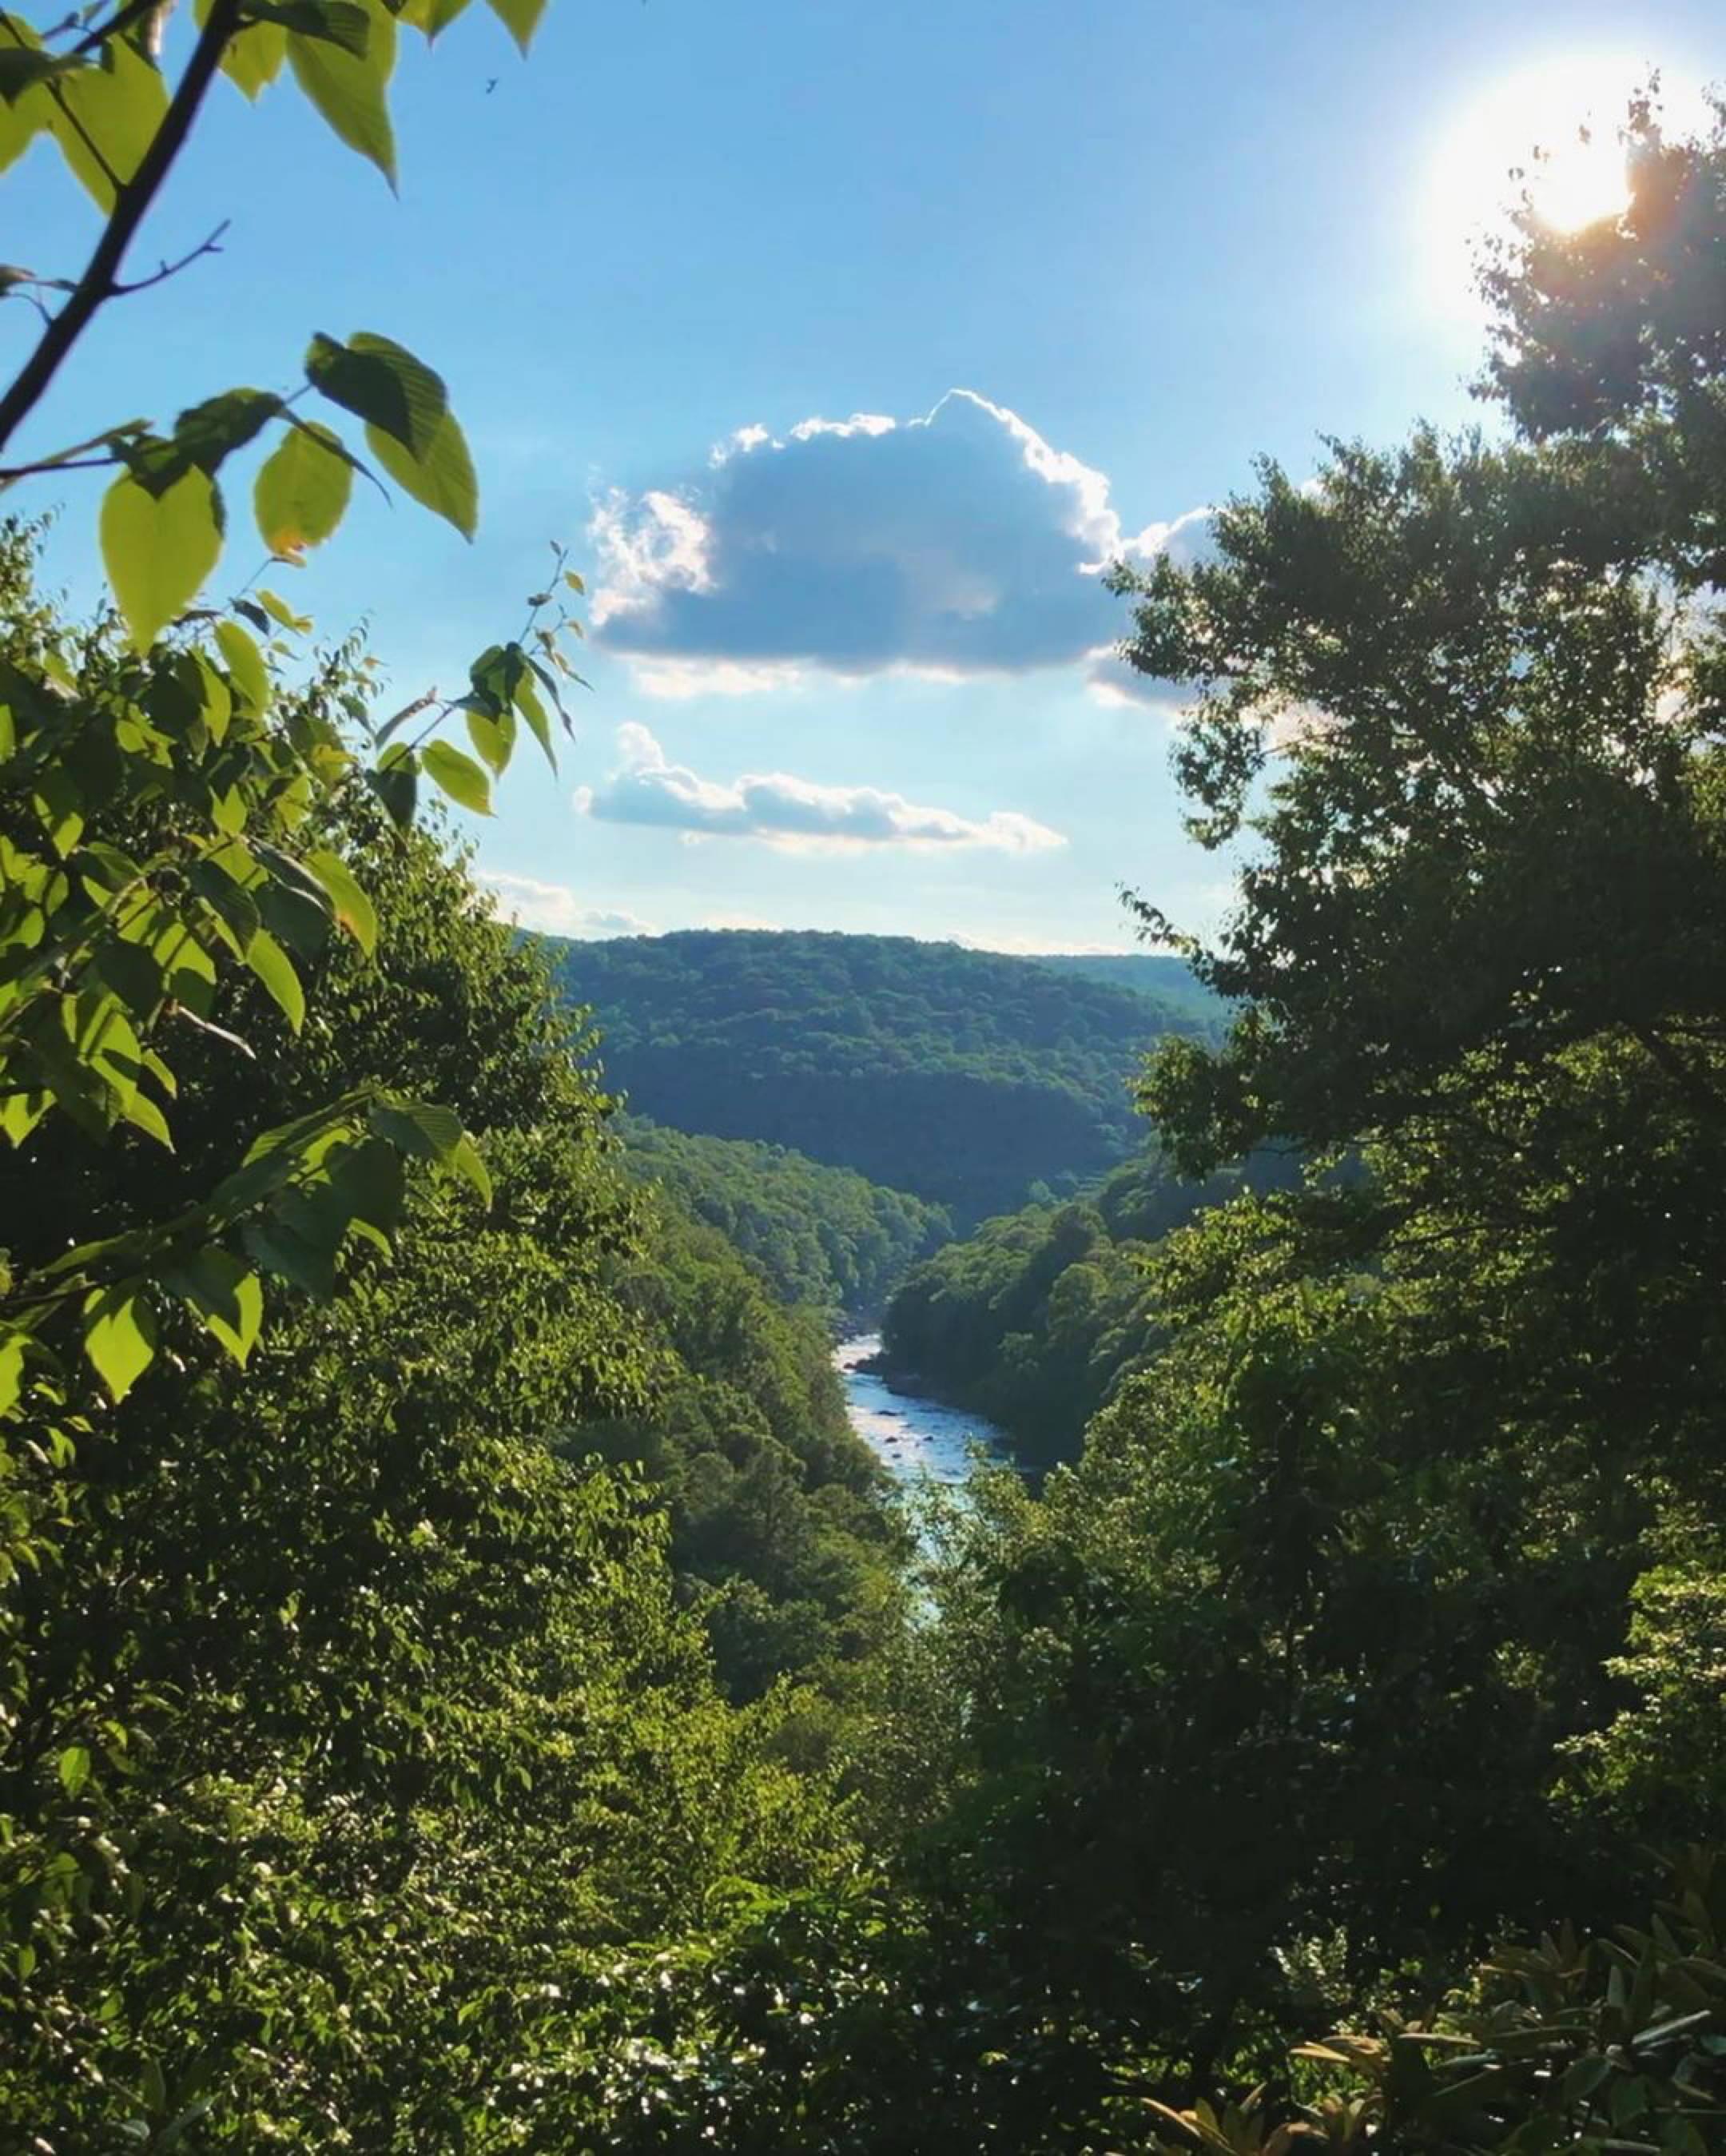 Bear Run Trail Overlook near Mill Run, Ohiopyle, and Fallingwater